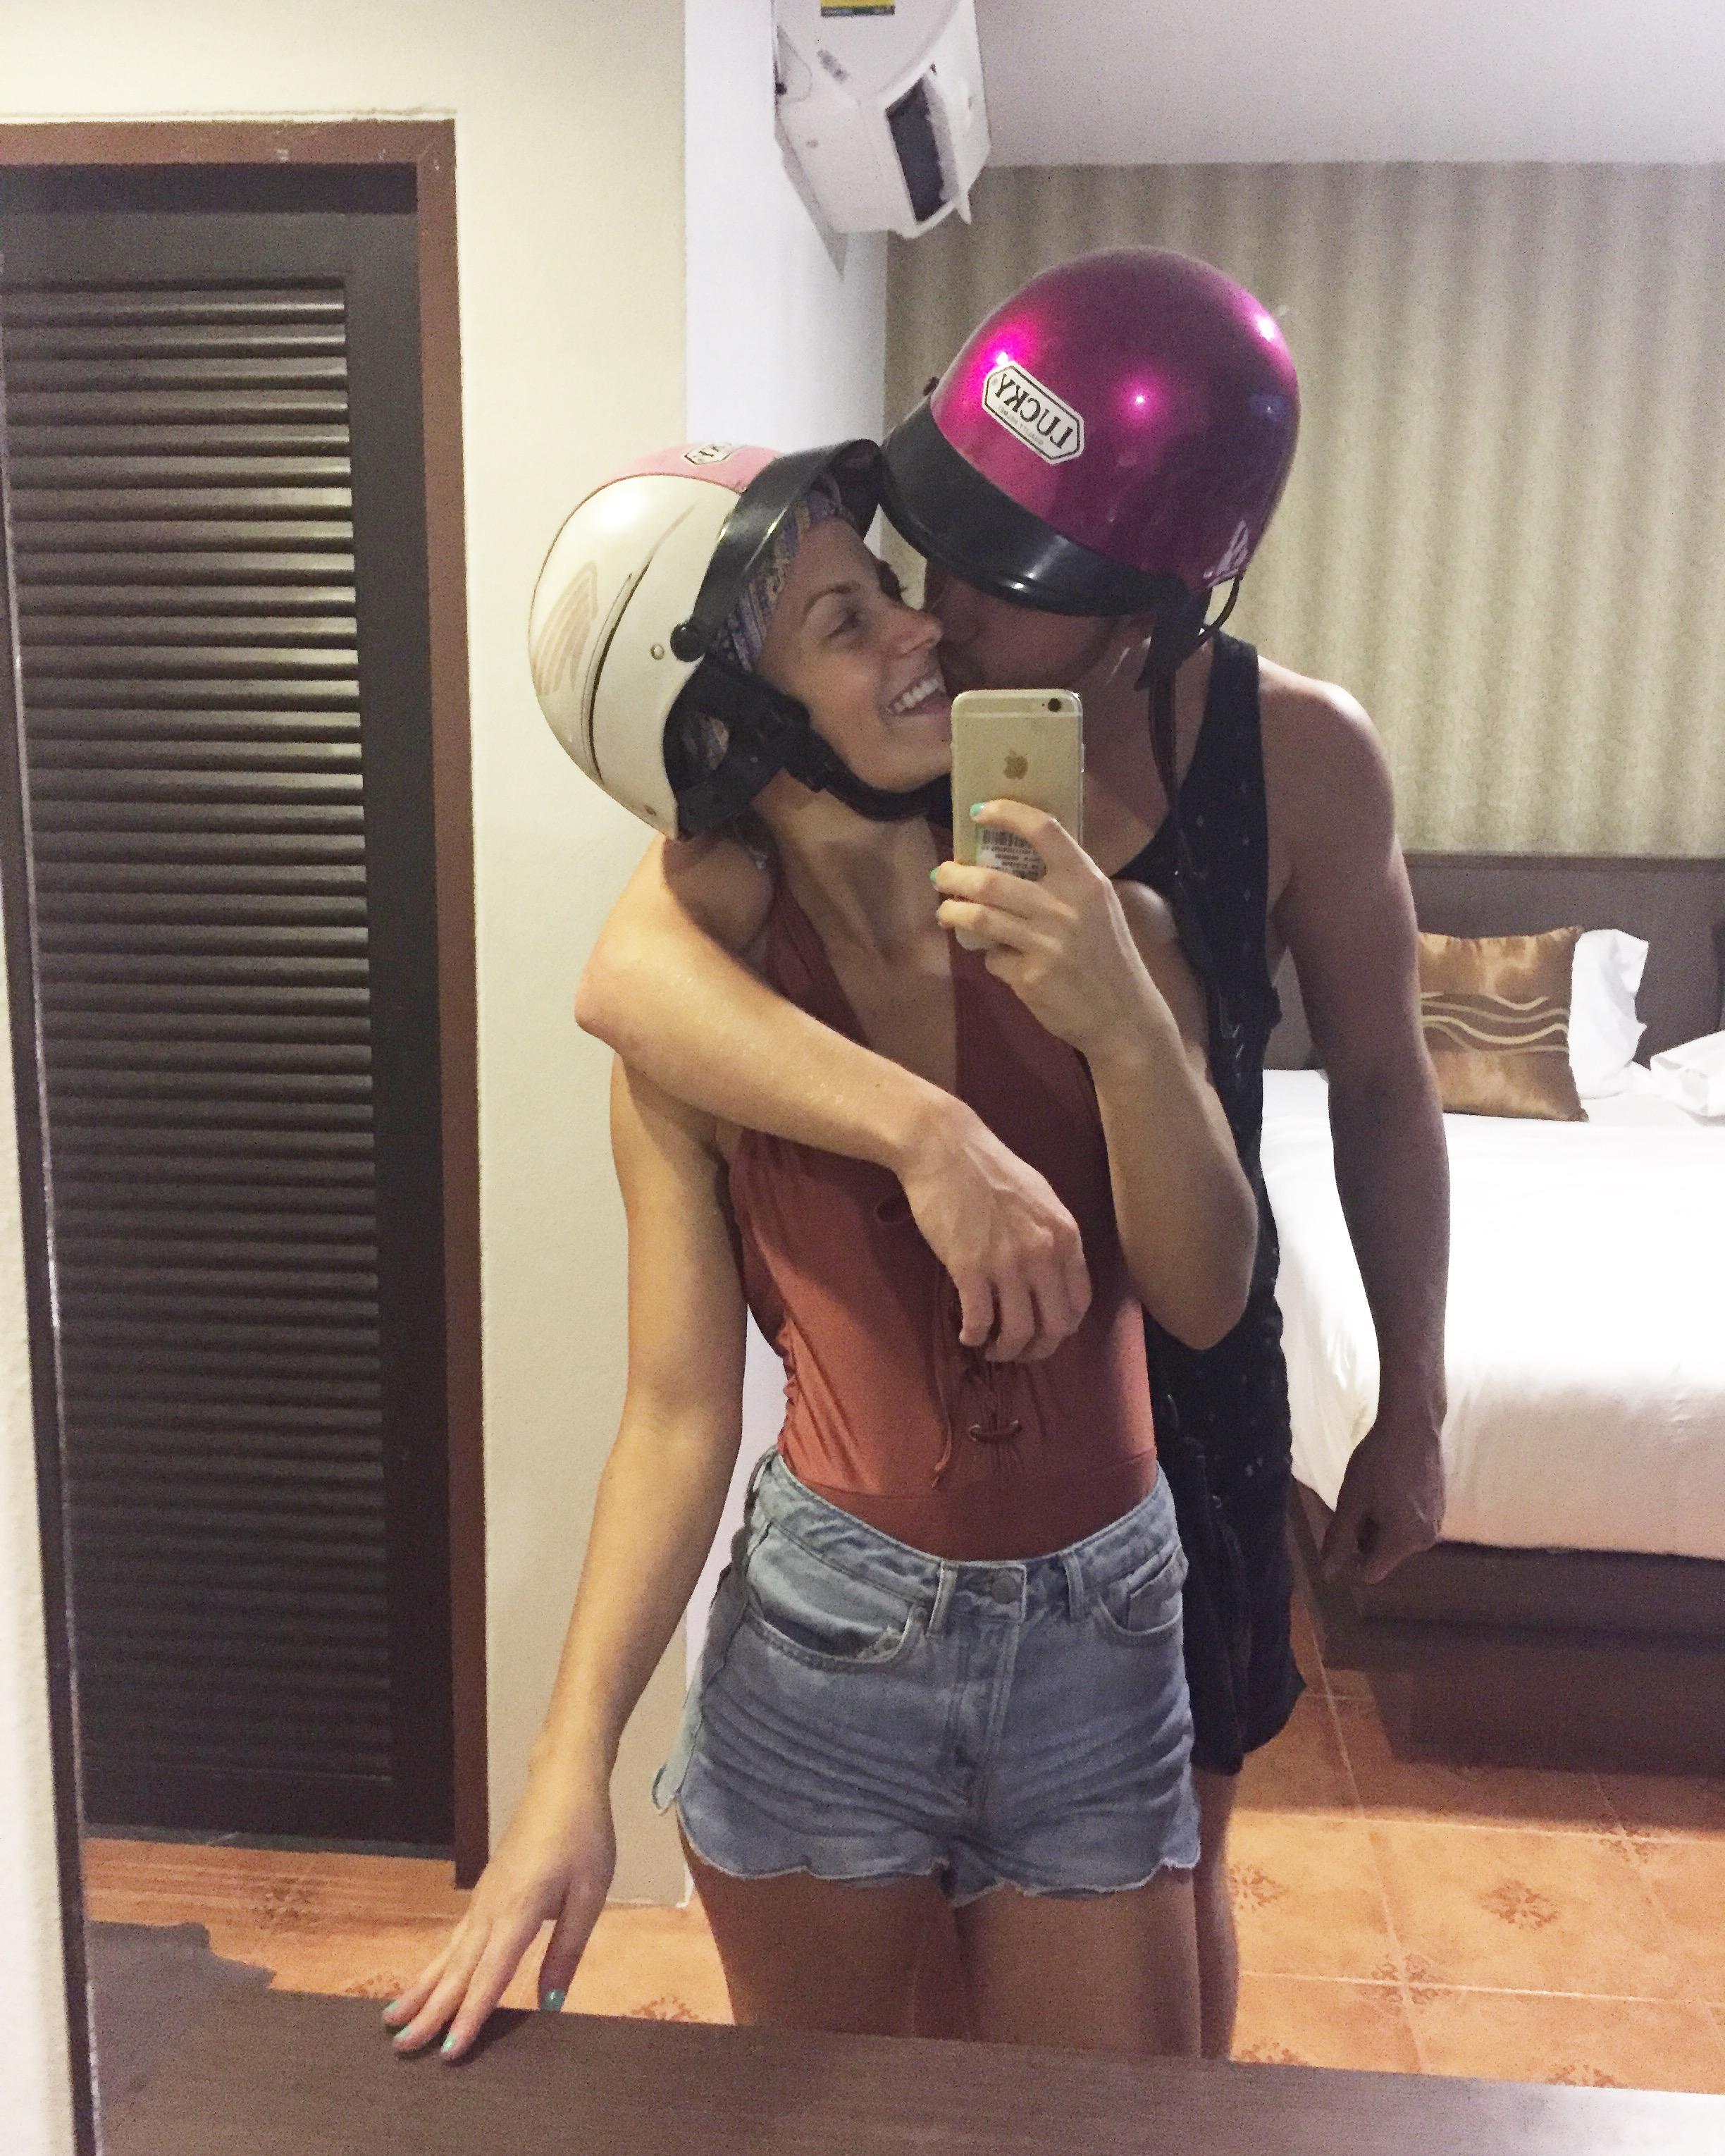 Bangkok, Koh Lanta, travel, wanderlust, couple, backpack, lifestyle, world, earth, fitfam, fitdutchies, goals, beach, sun, fun